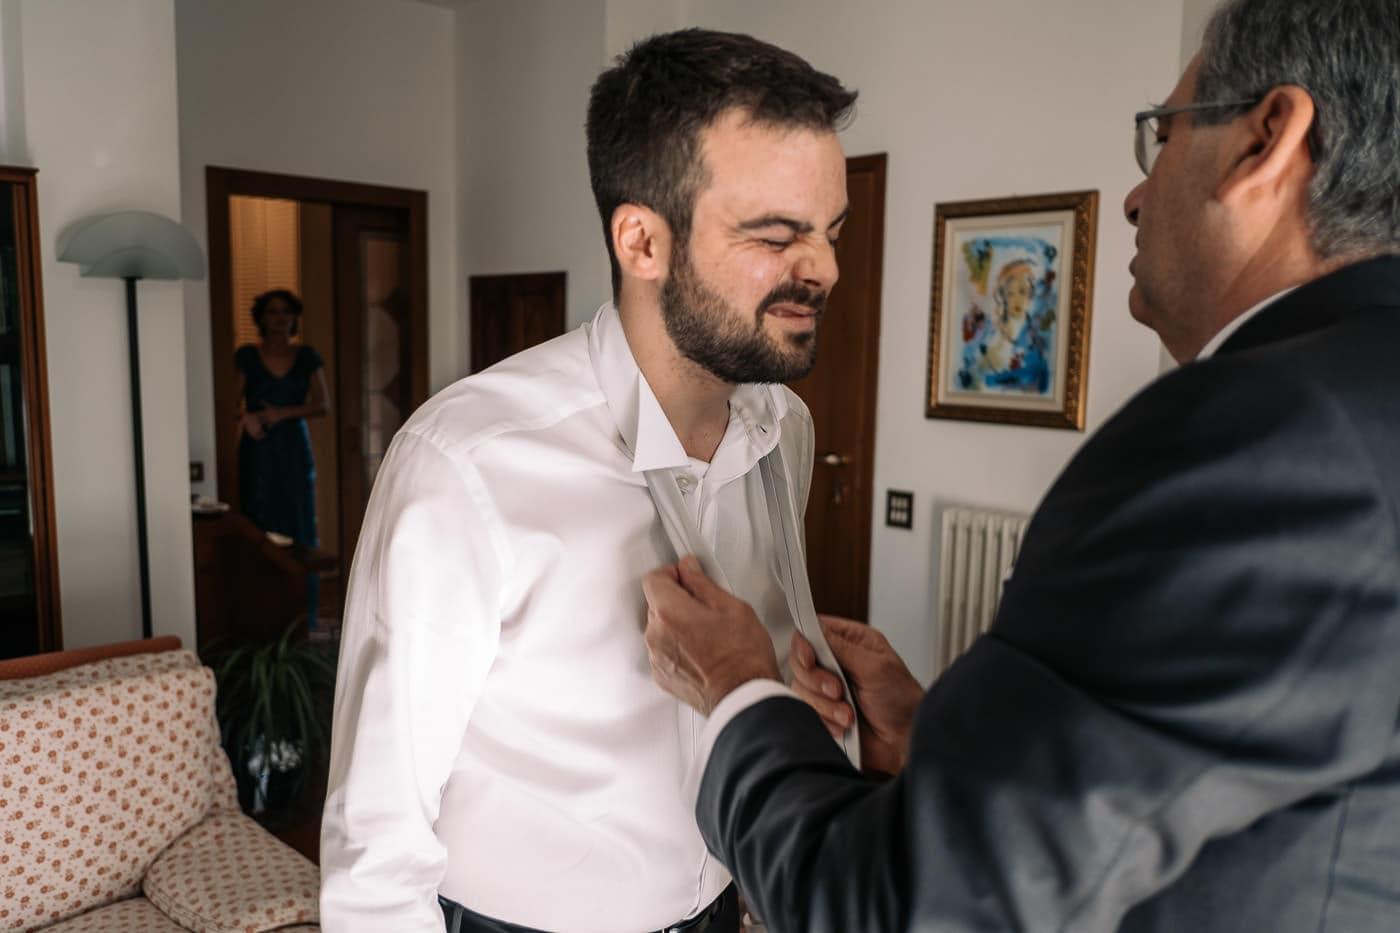 abito sposo matrimonio_castello durini